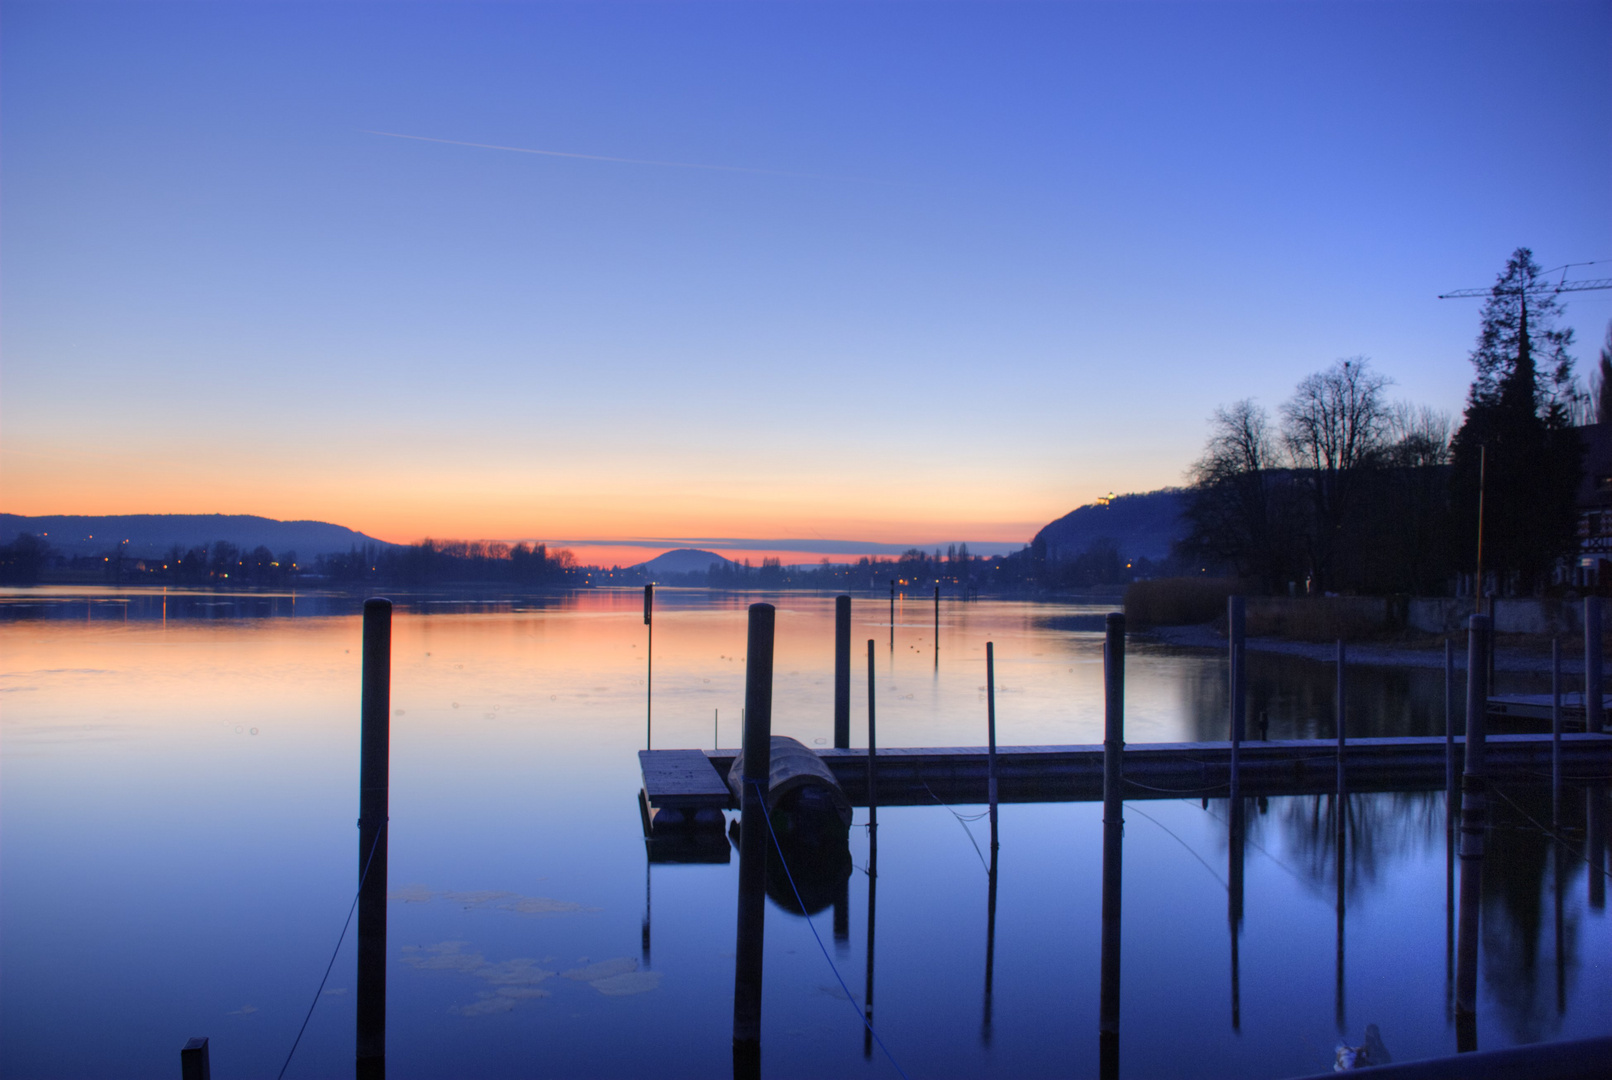 Ruhe auf dem See